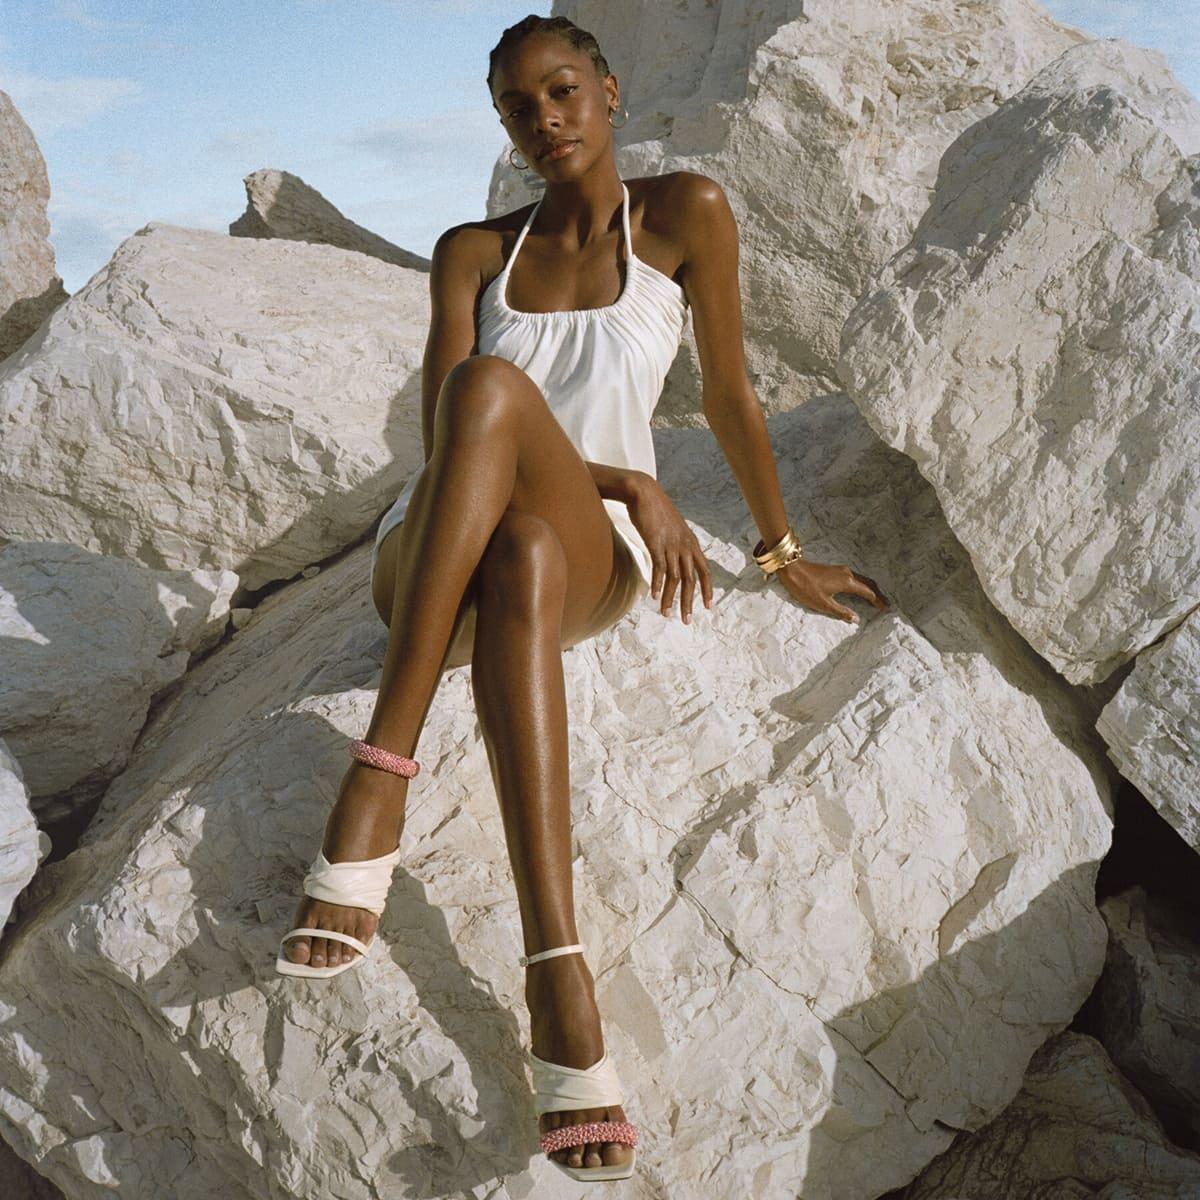 Model wearing Jimmy Choo's Ocean 90 summer sandals featuring a pink bracelet